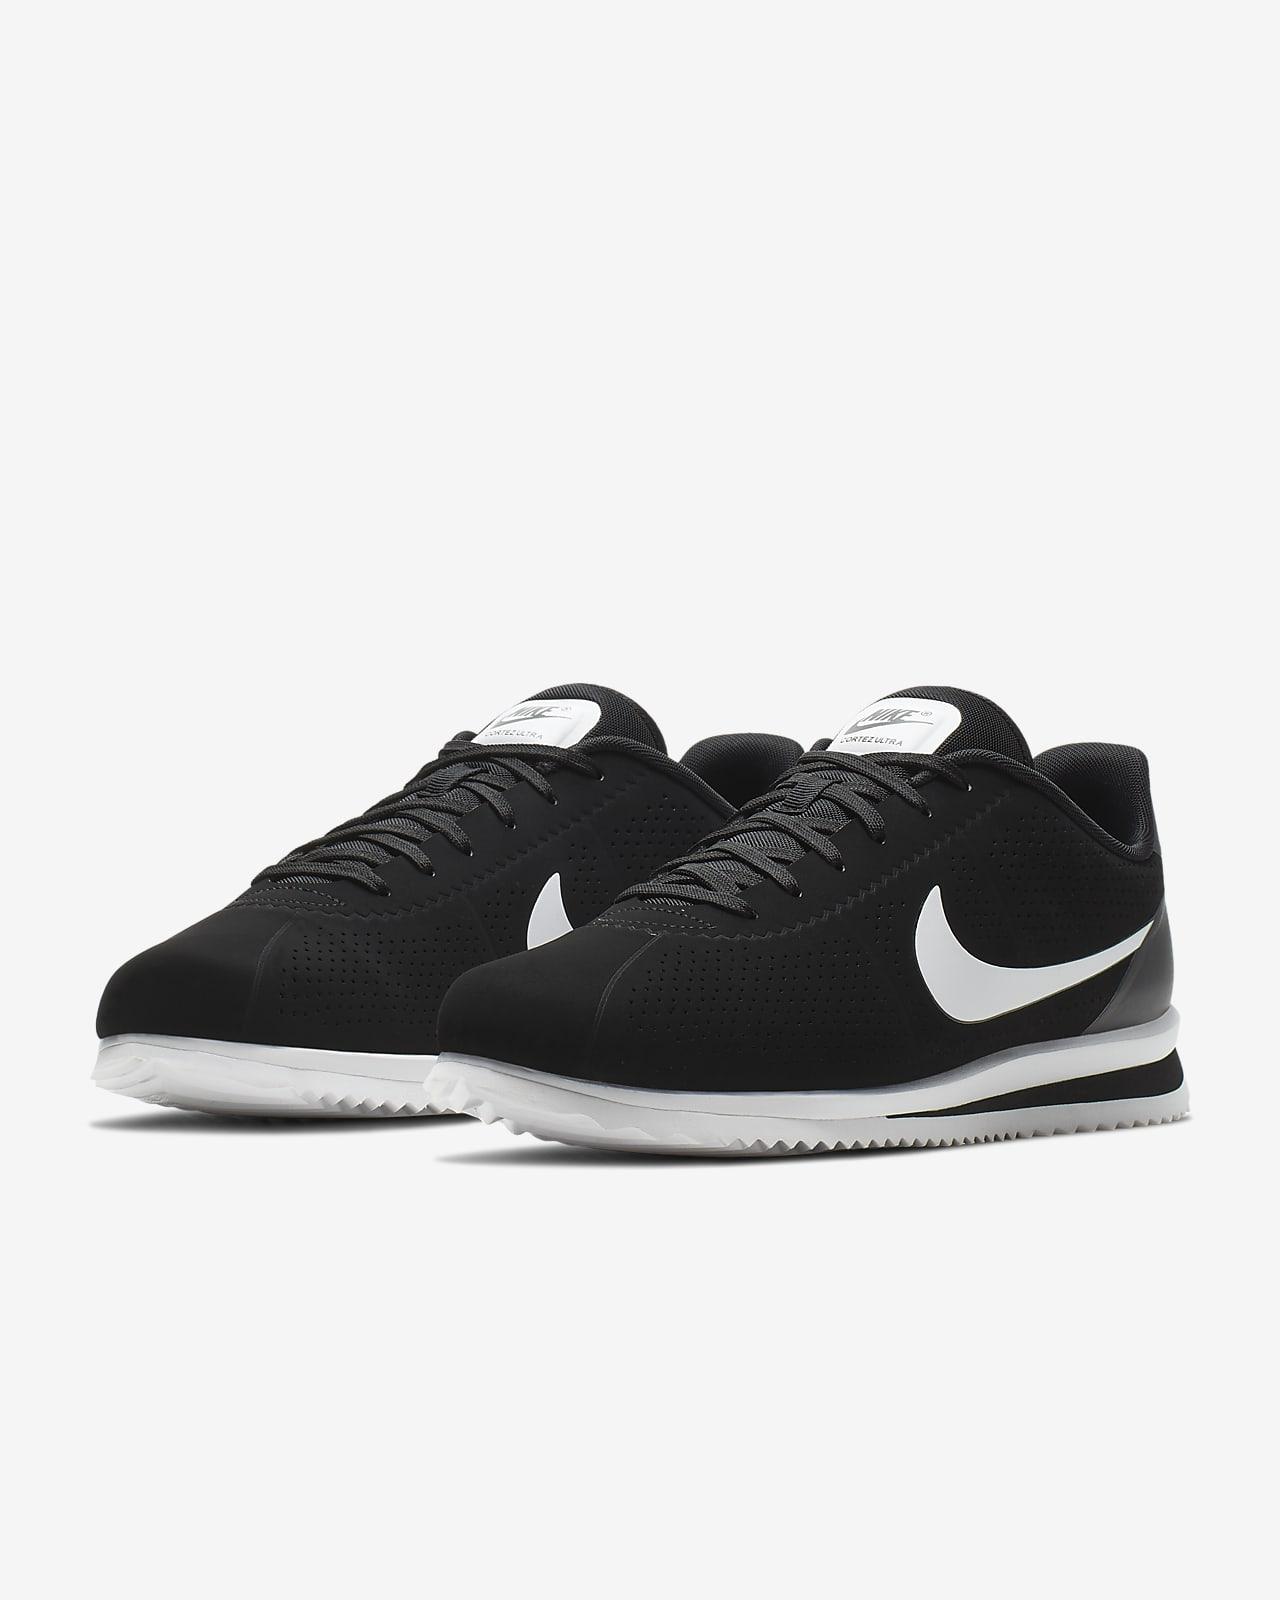 Nike Cortez Ultra Moire Men's Shoe. Nike FI